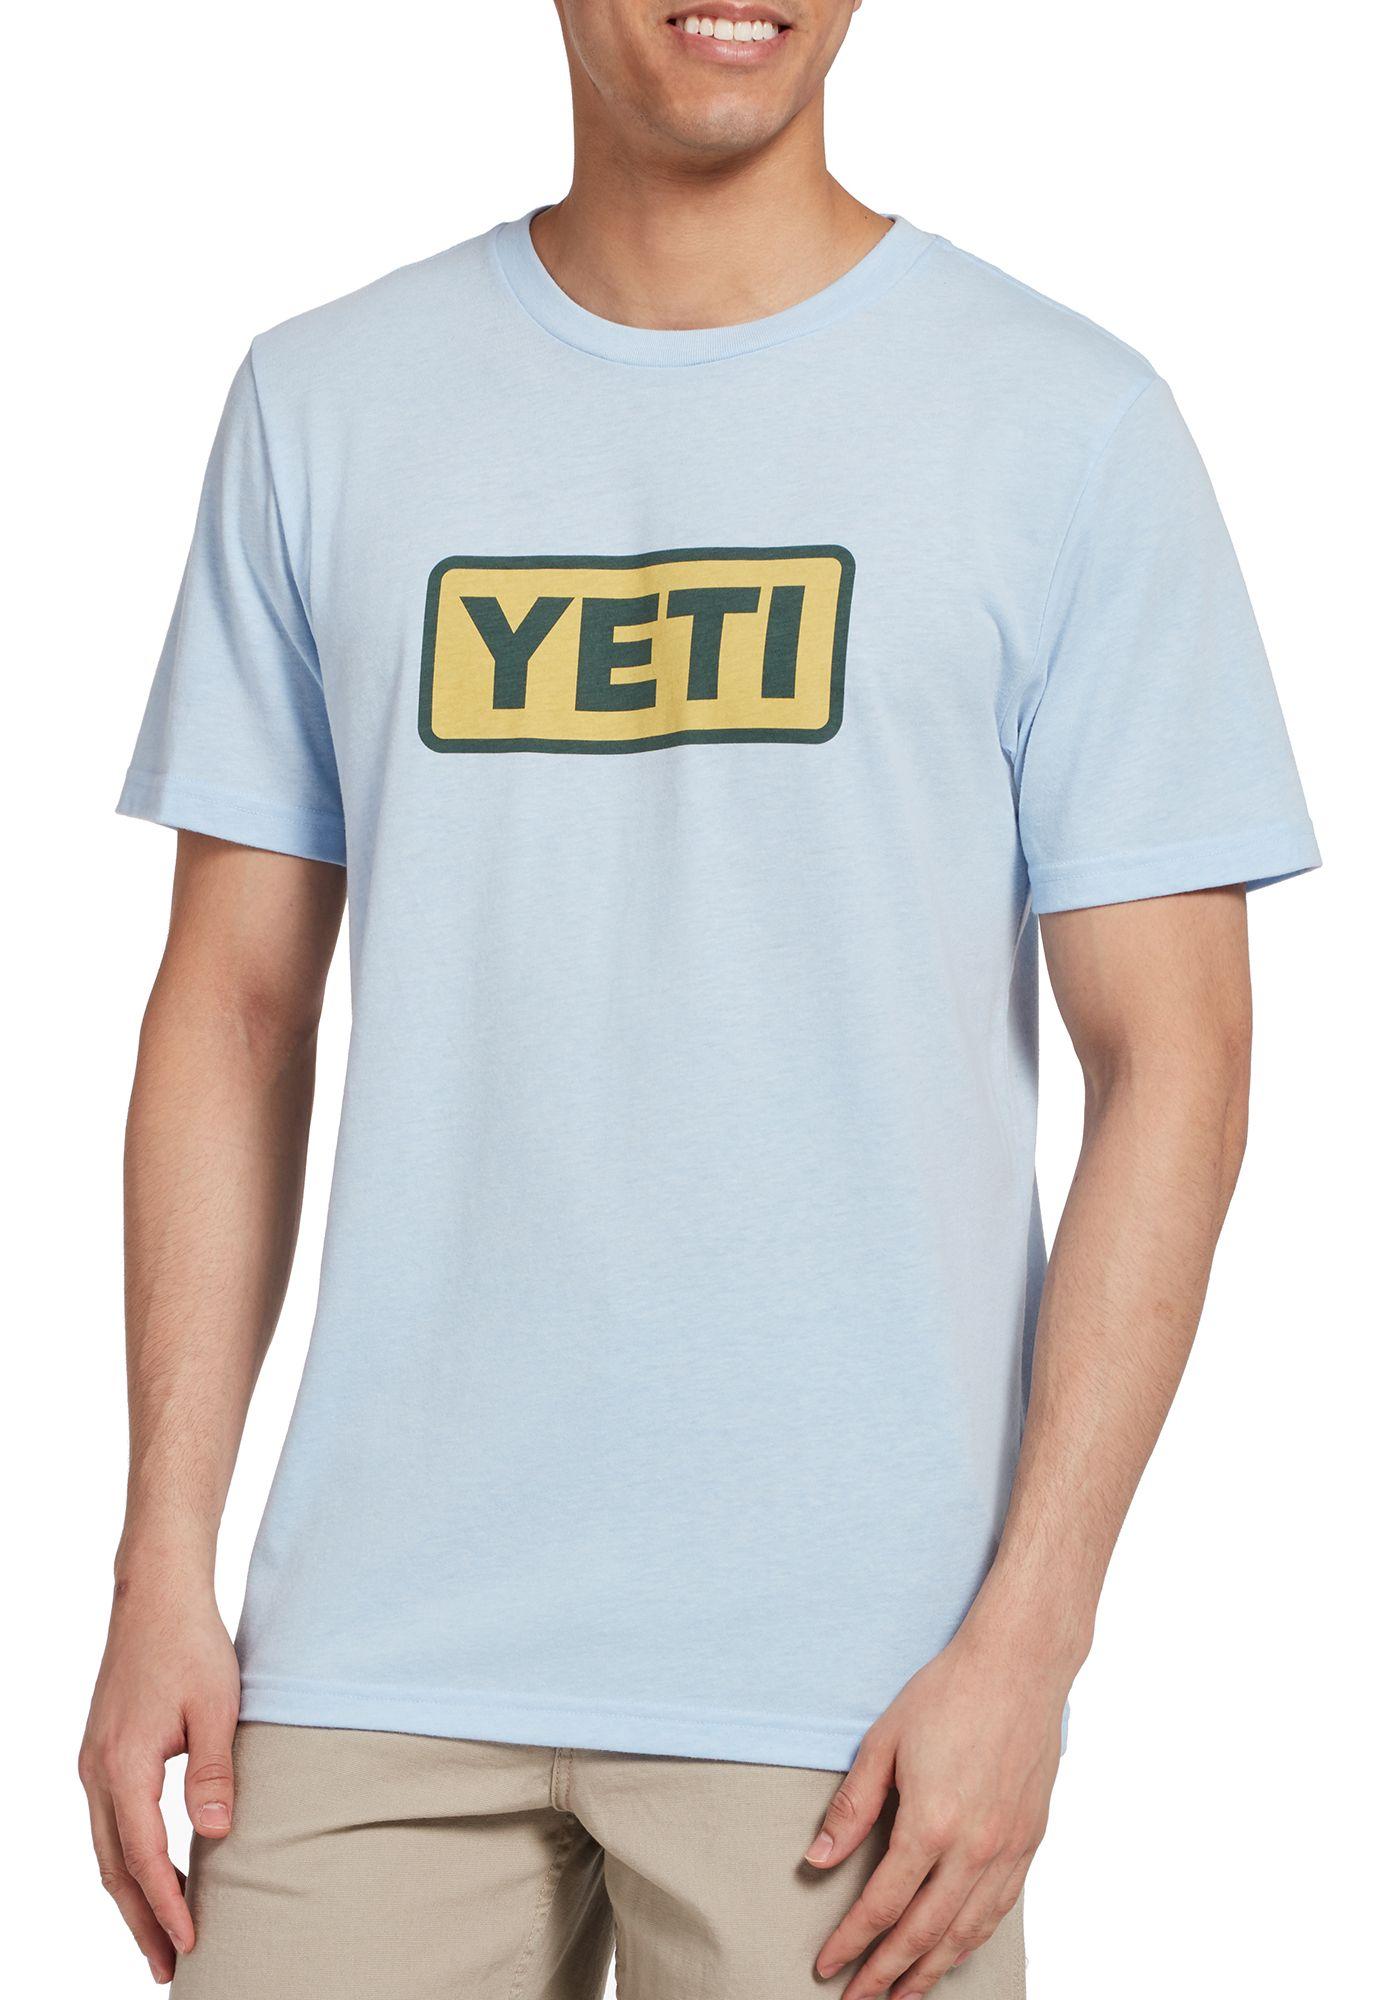 YETI Men's Core Badge Logo Short Sleeve T-Shirt